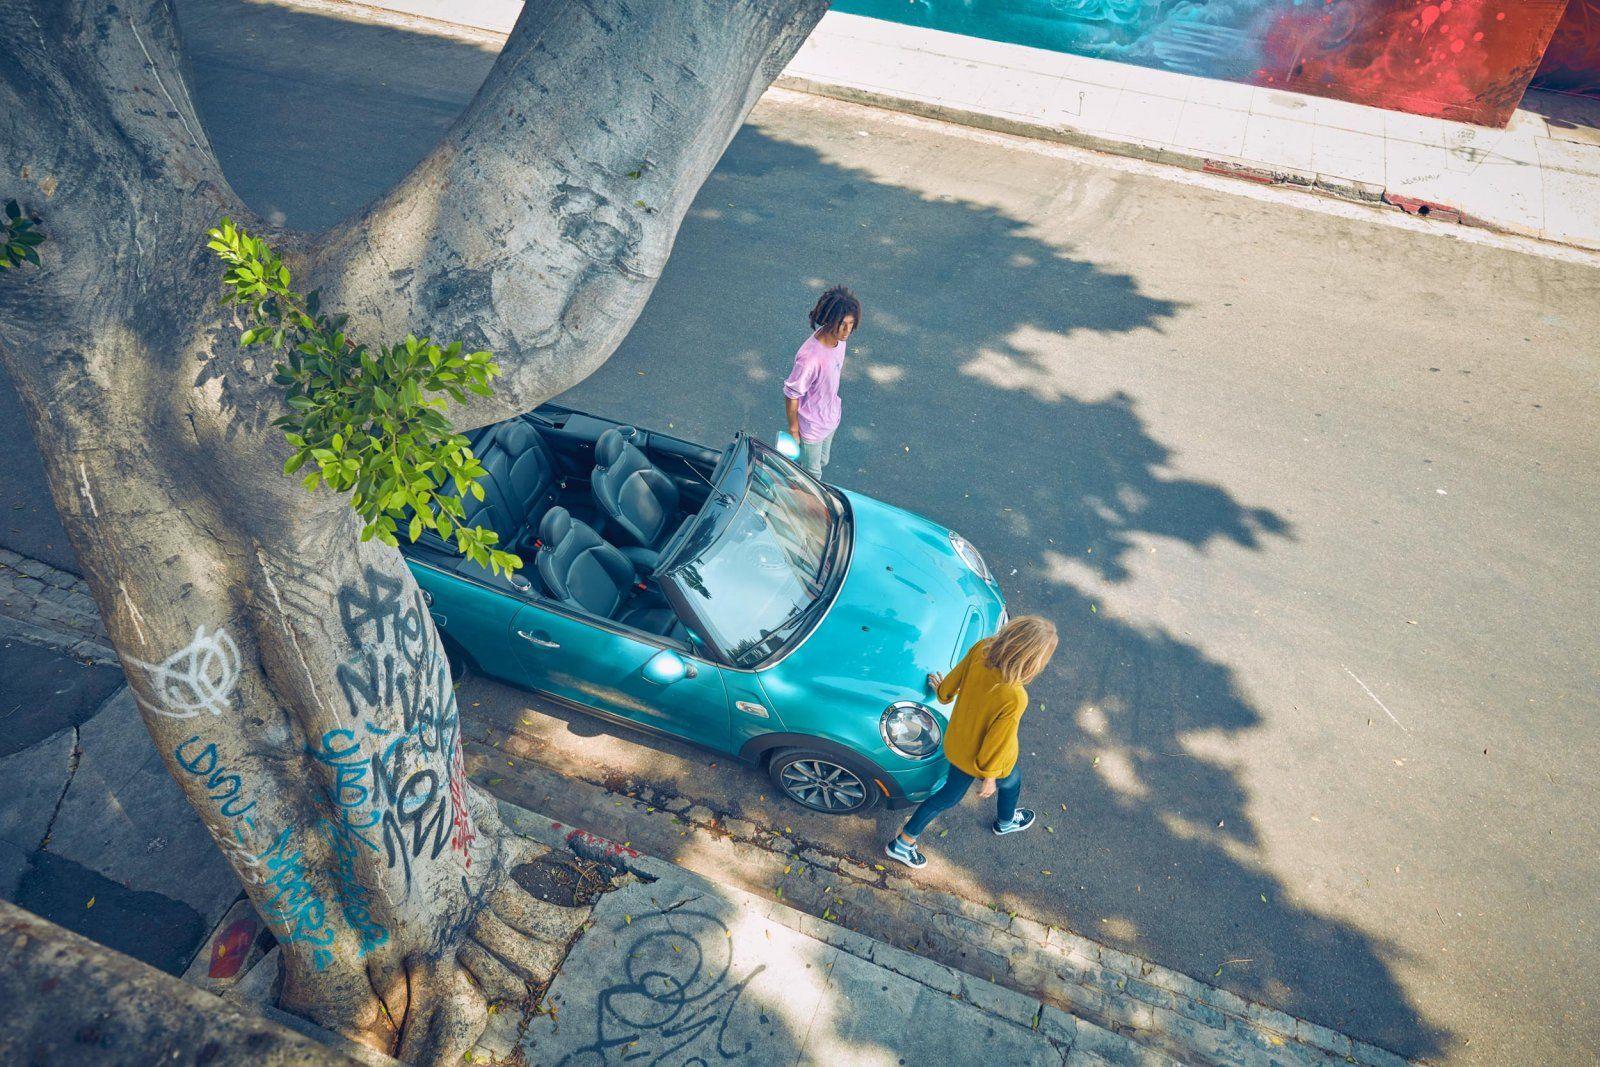 Markus Wendler Mini Cooper Mini Cooper Los Angeles Photographer